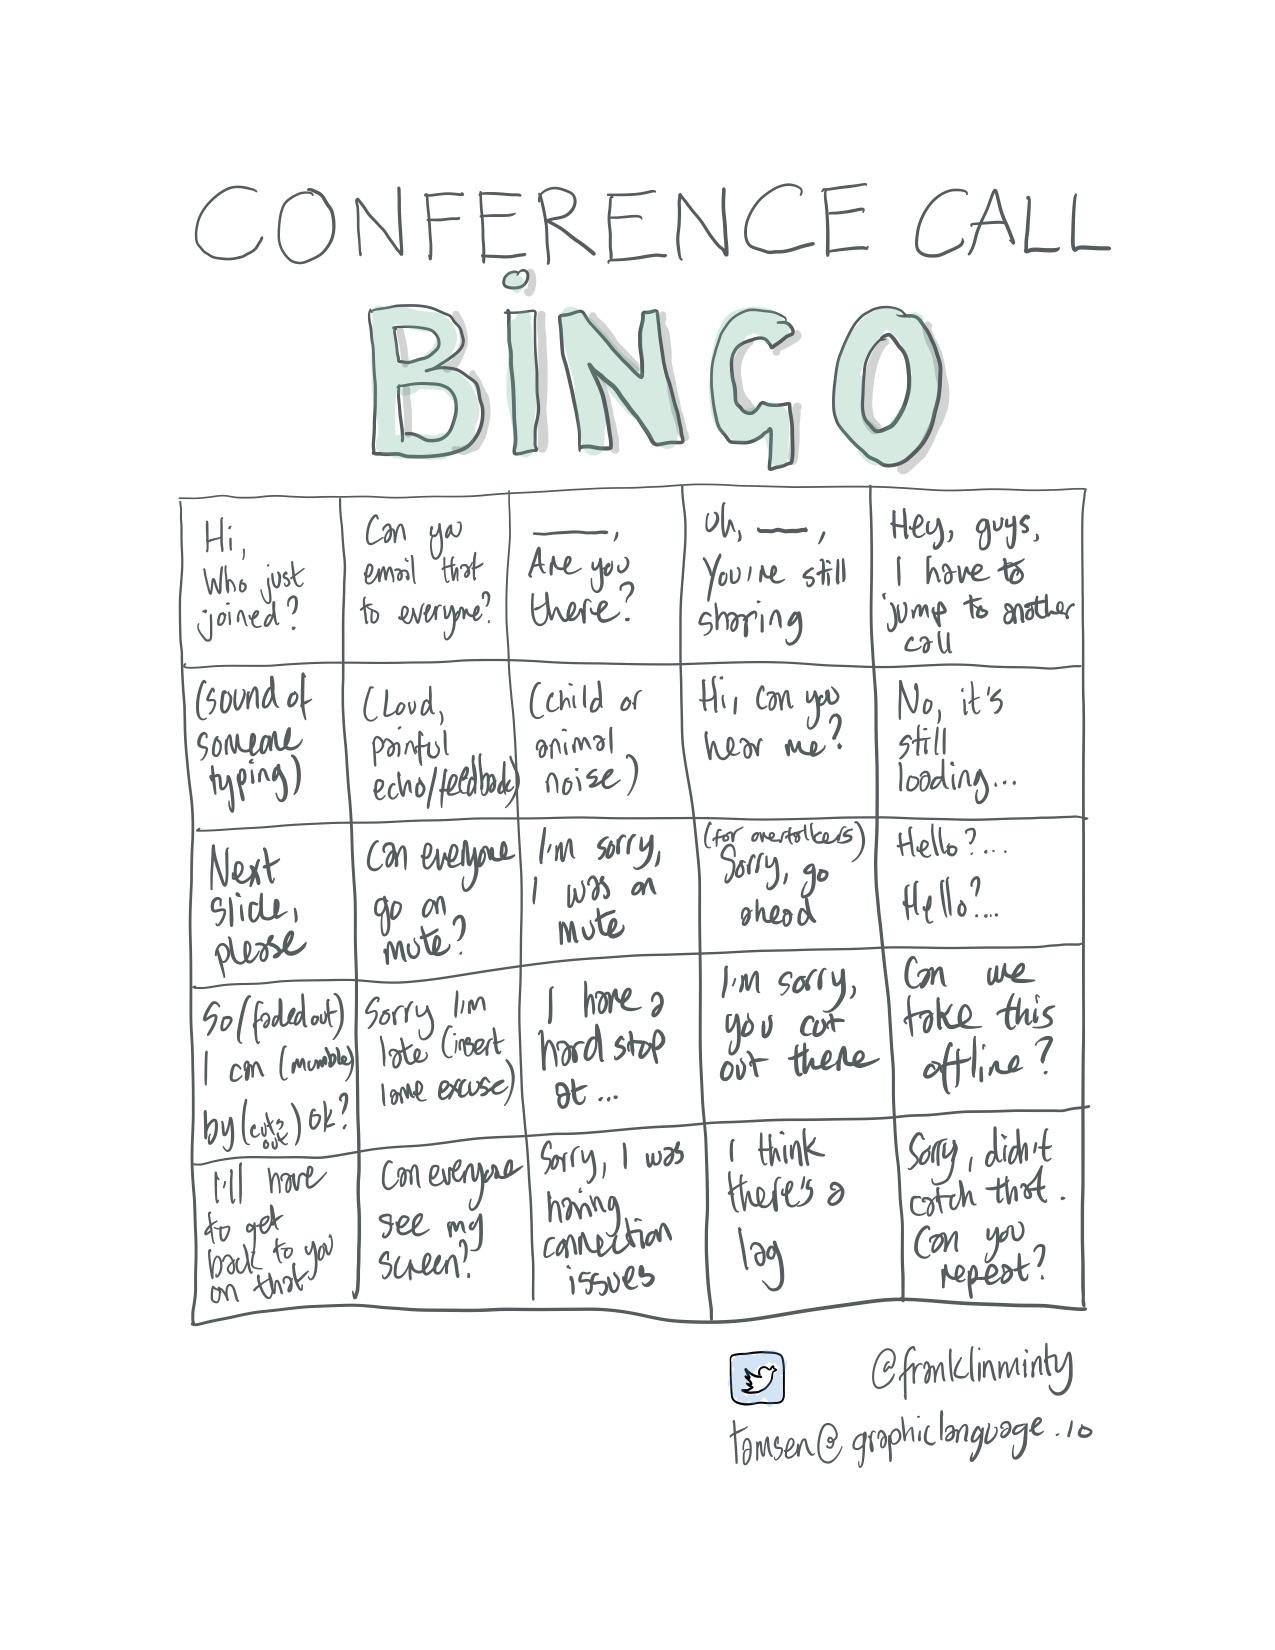 Conference call bingo.jpg